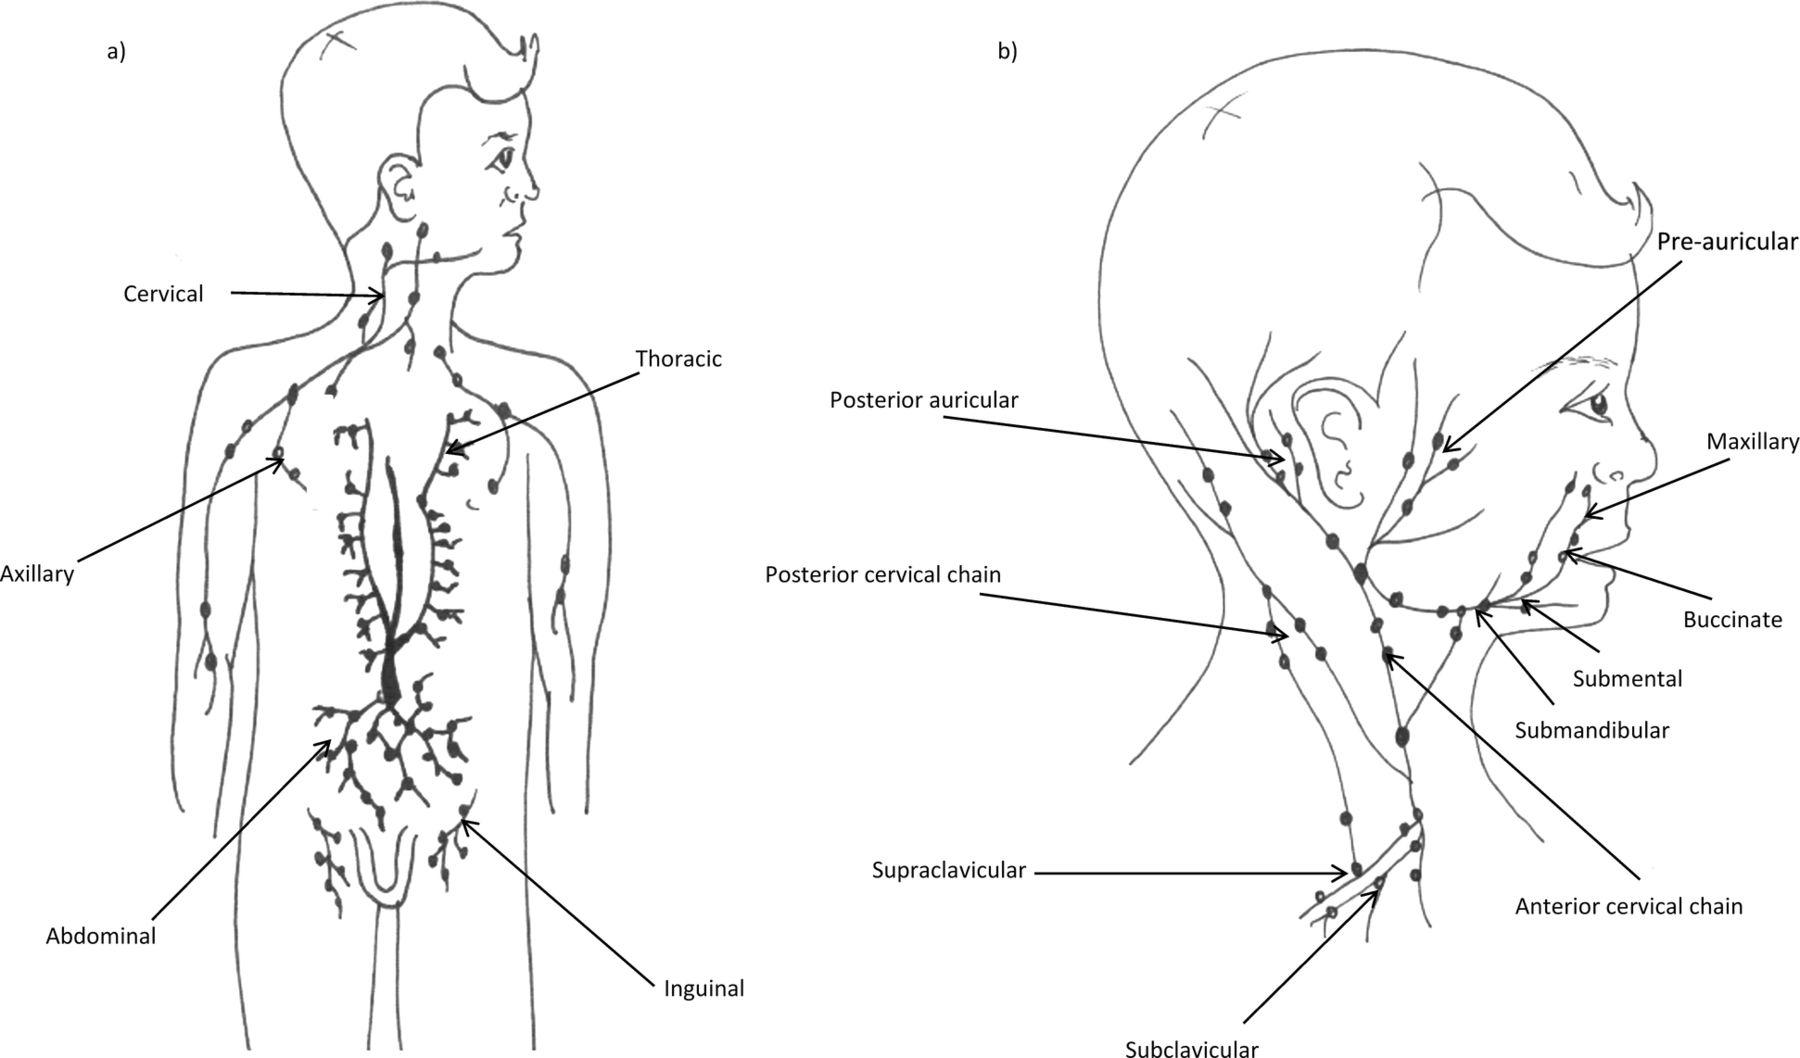 Lymphadenopathy In Children Refer Or Reassure